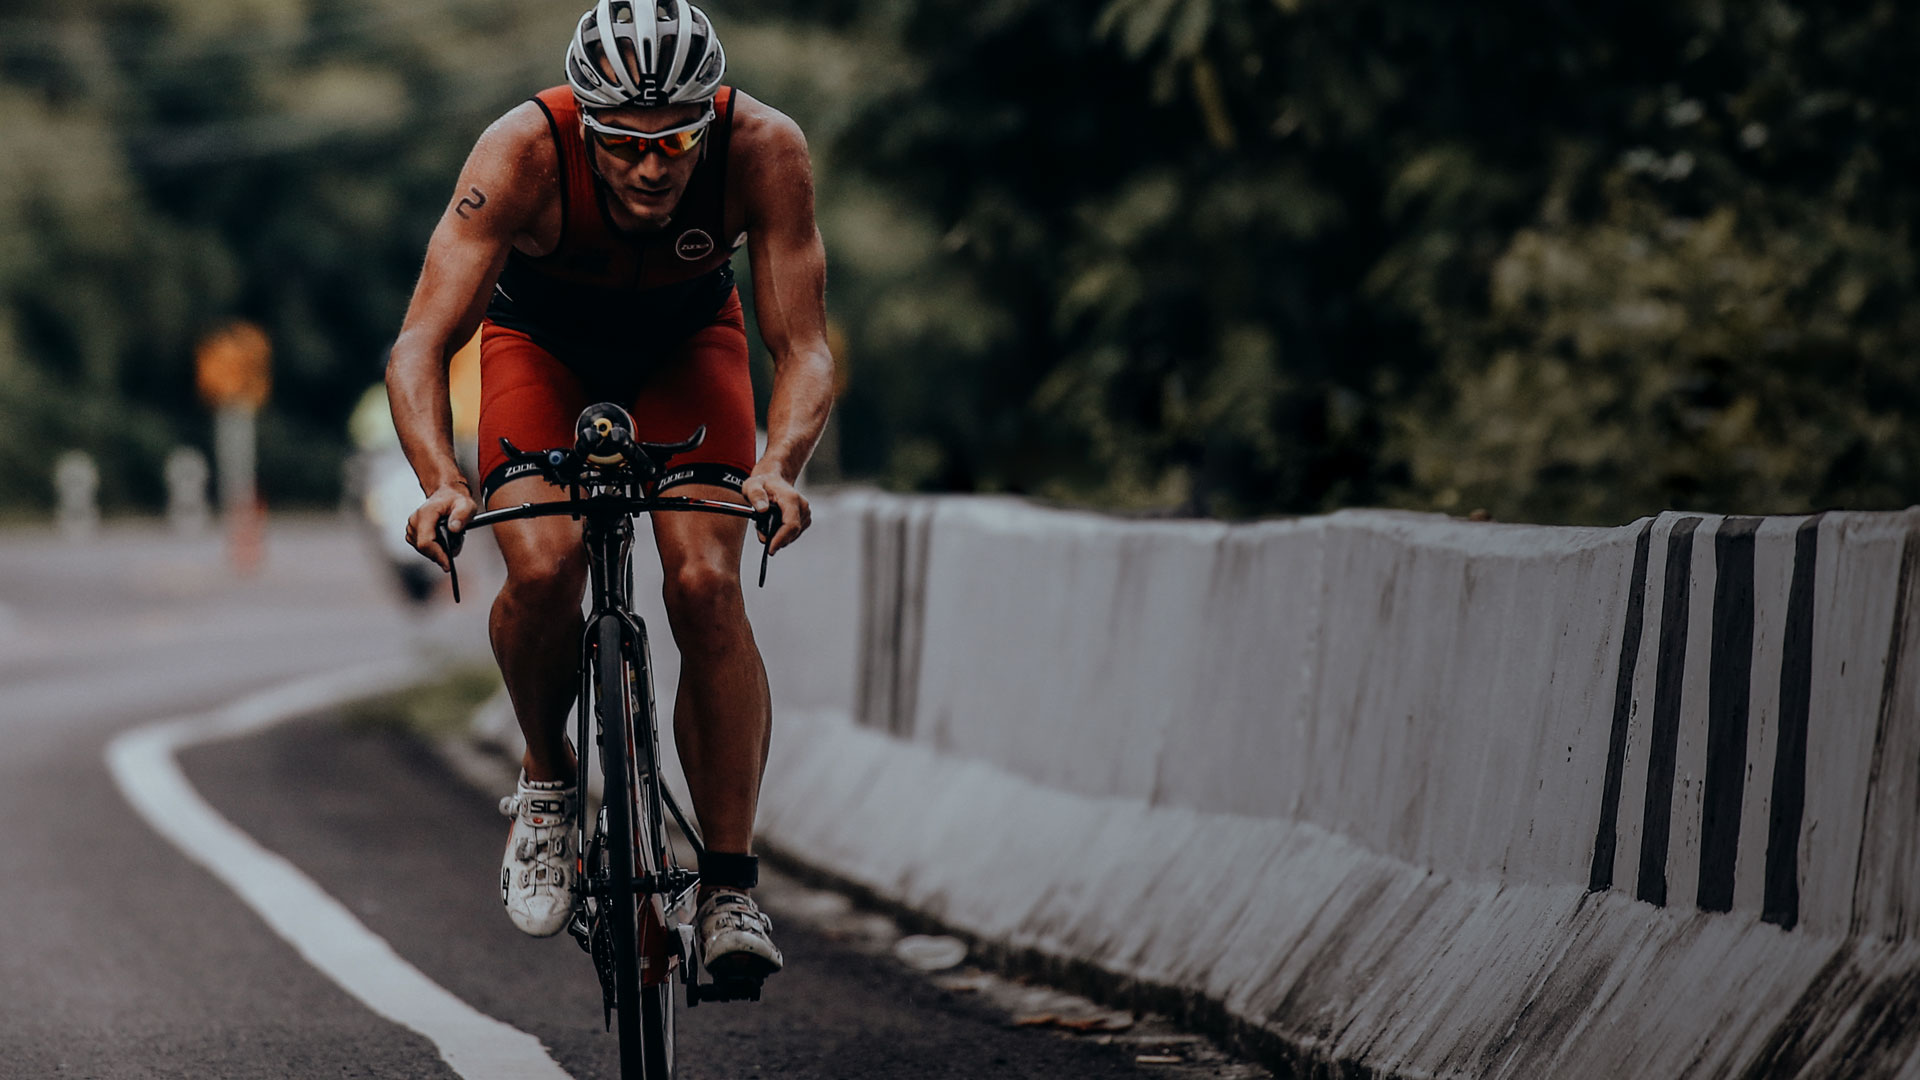 MKC pro triathlete, Alex Polizzi